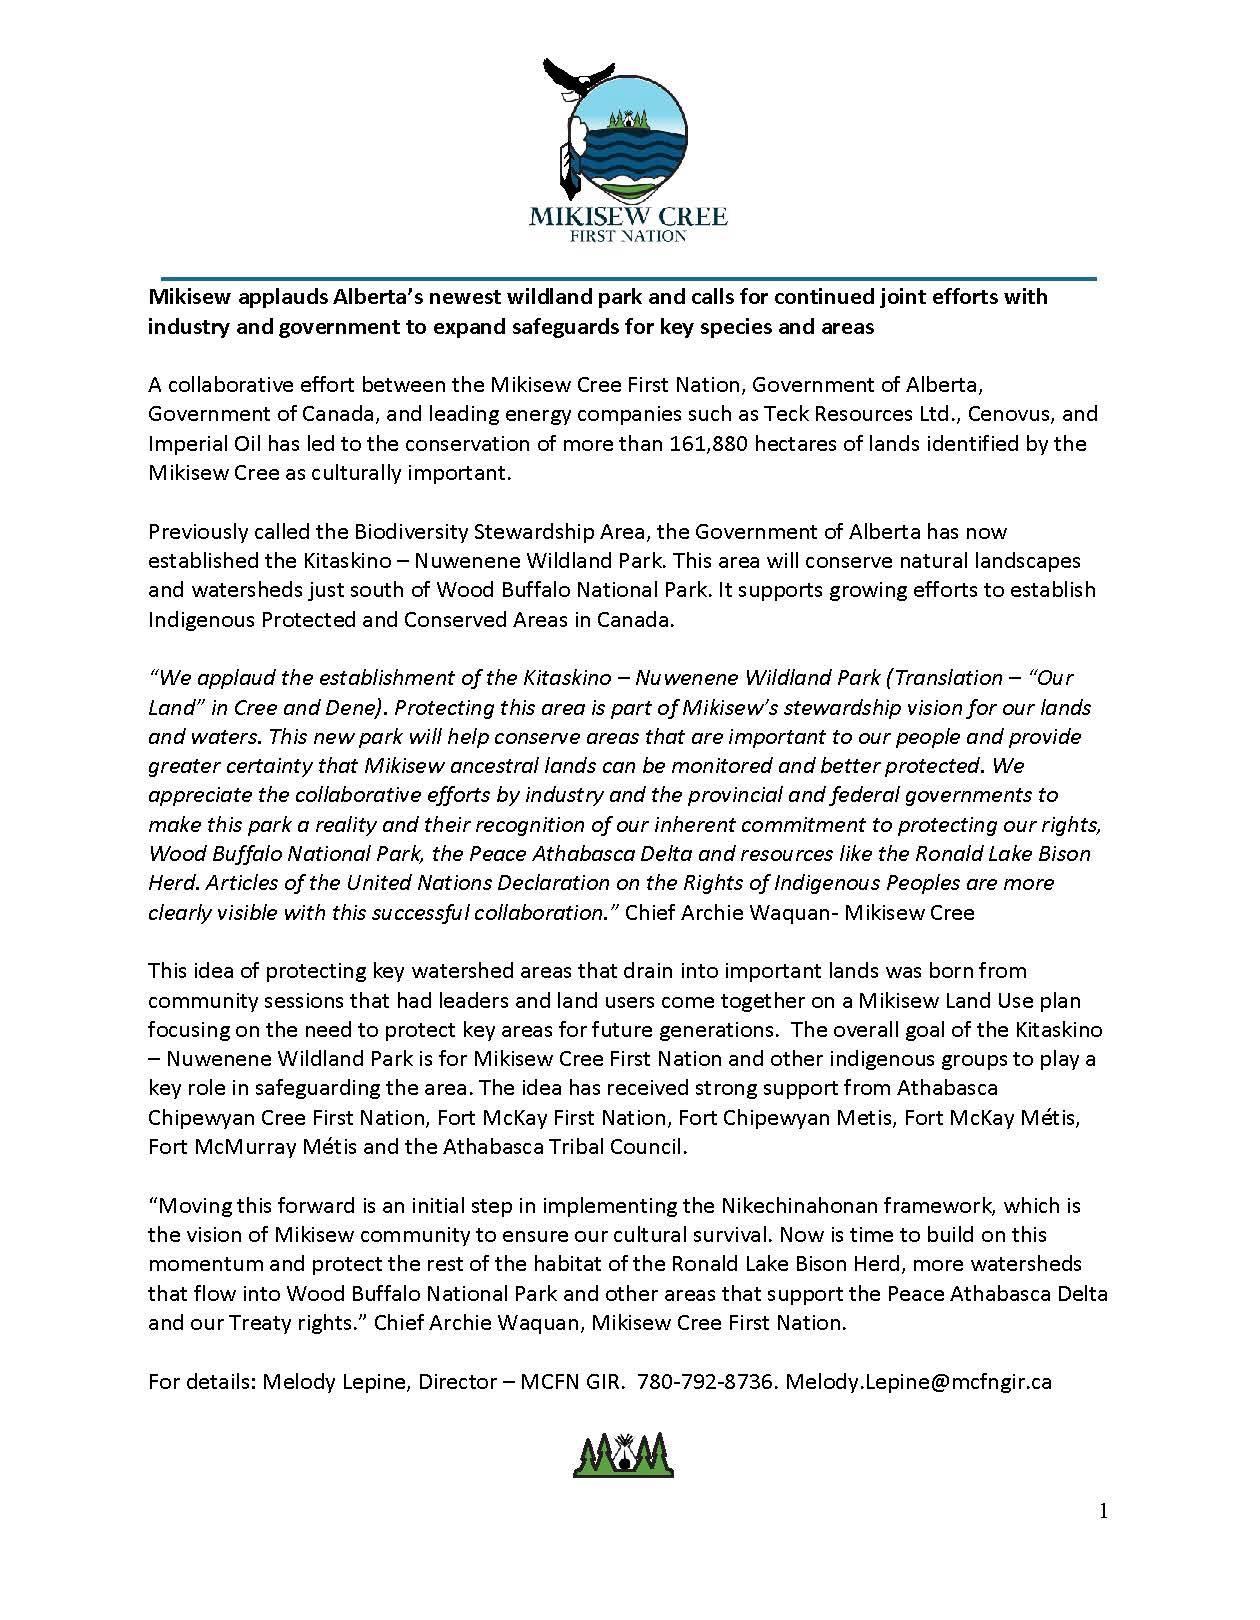 KNWP BSA MCFN press release.JPG